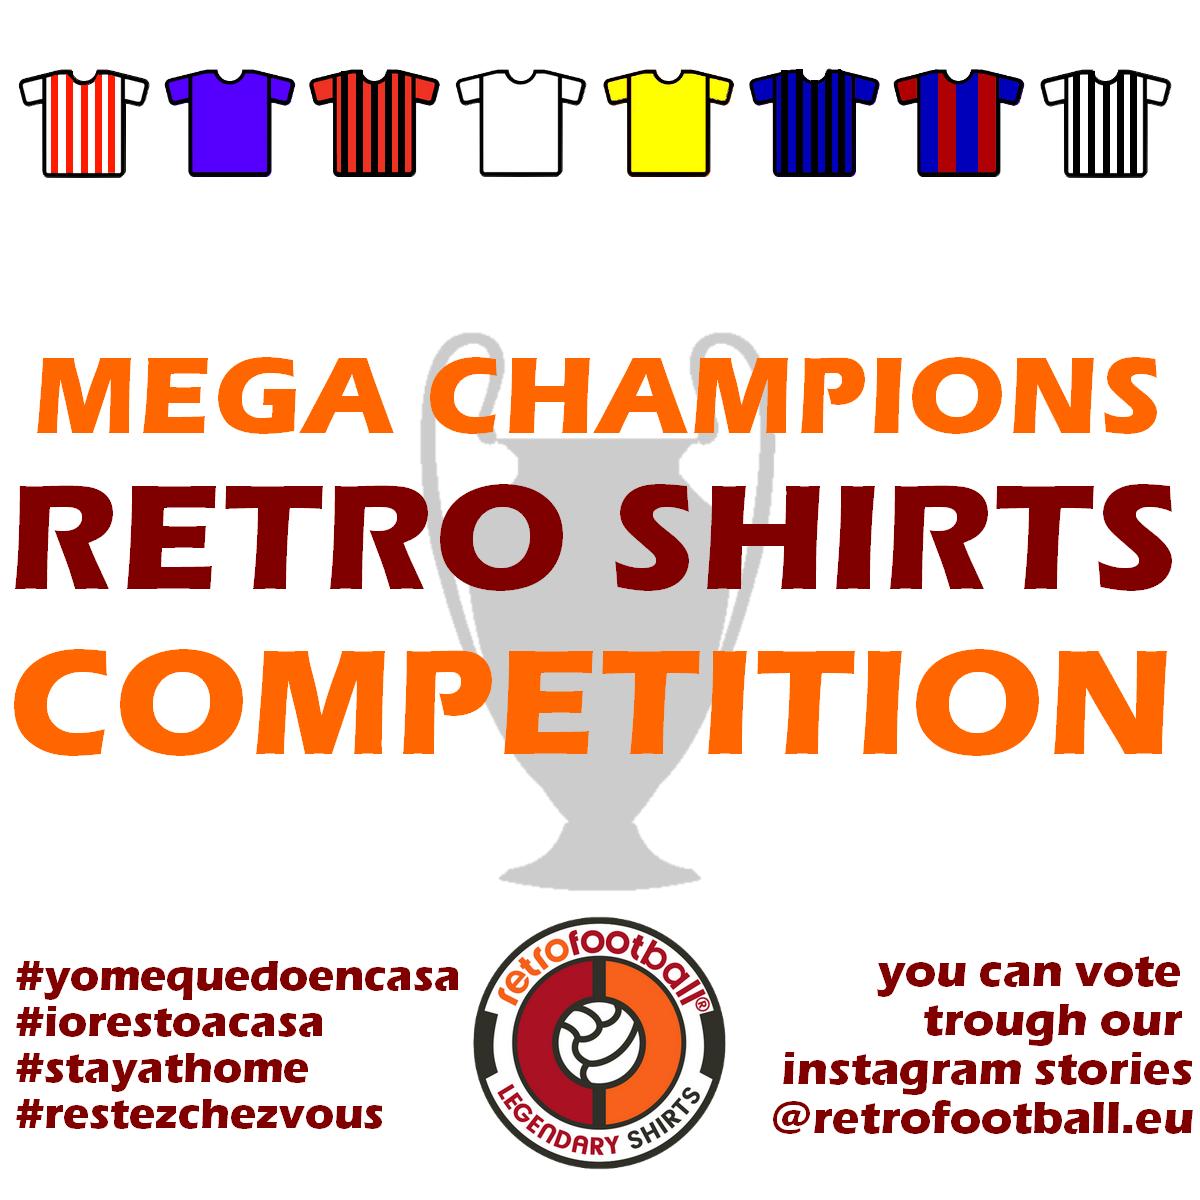 Mega Champions Retro Shirts Competition